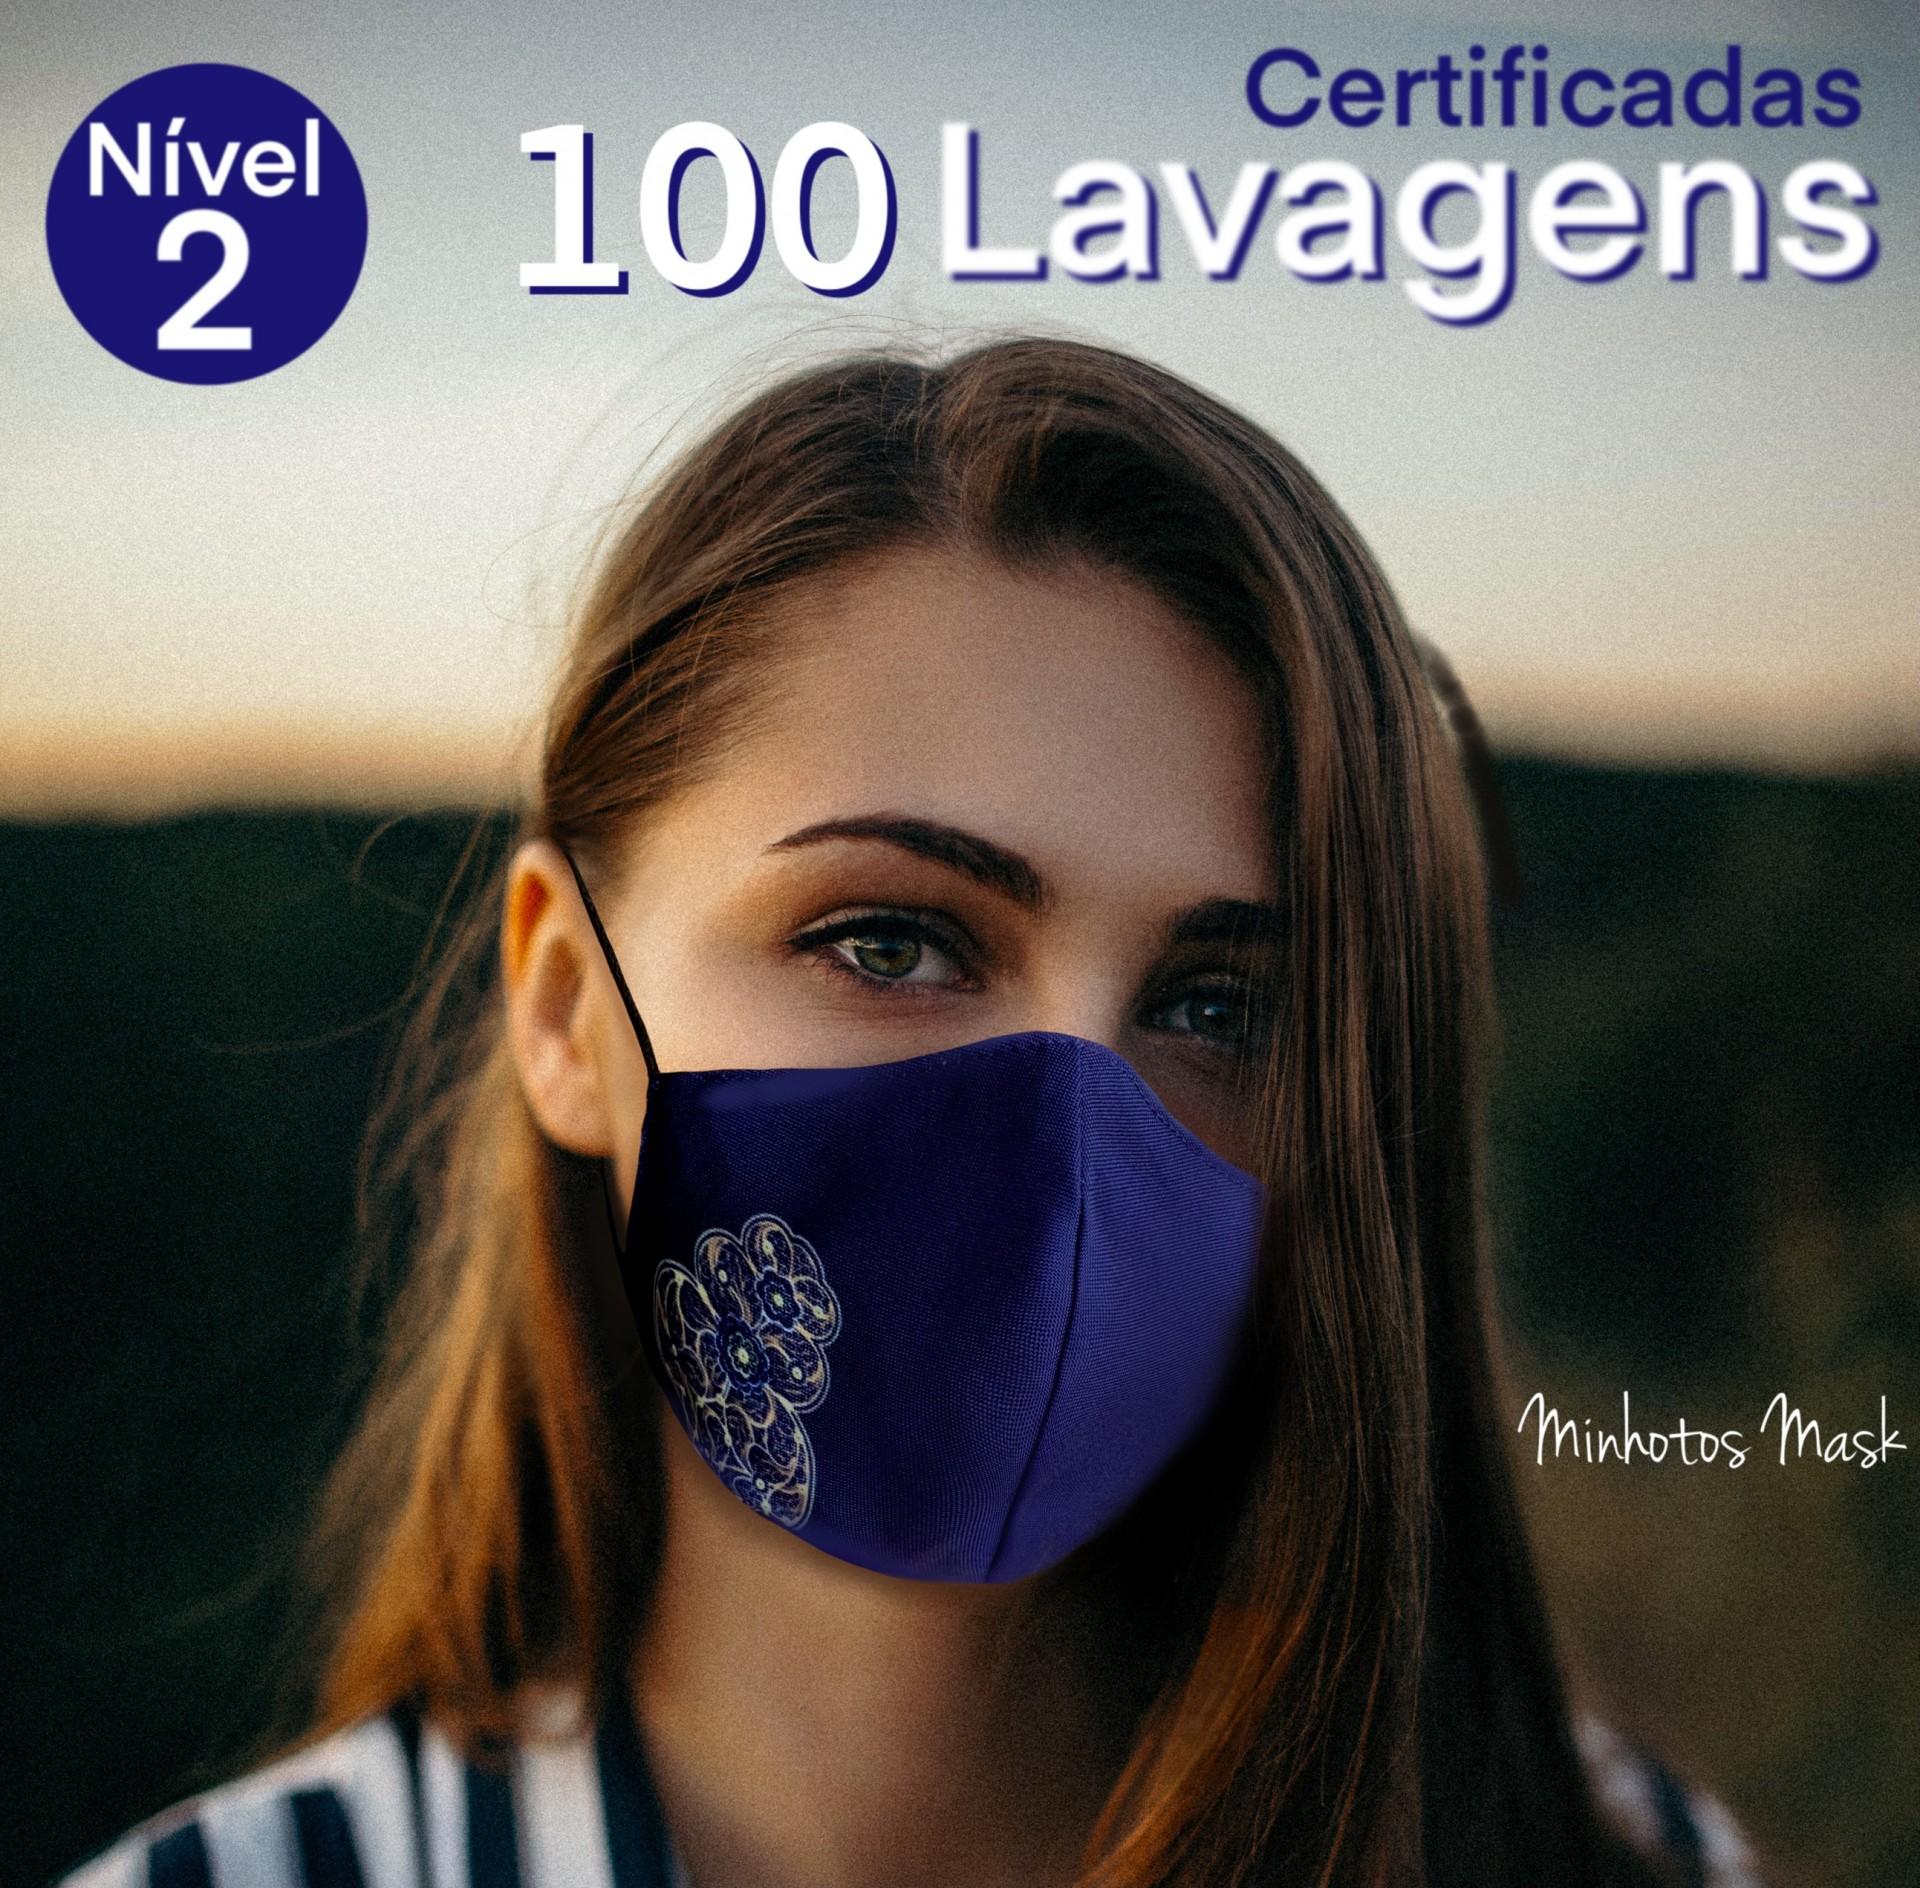 Máscara Minhotos Certificadas Nível 2 - 100 lavagens